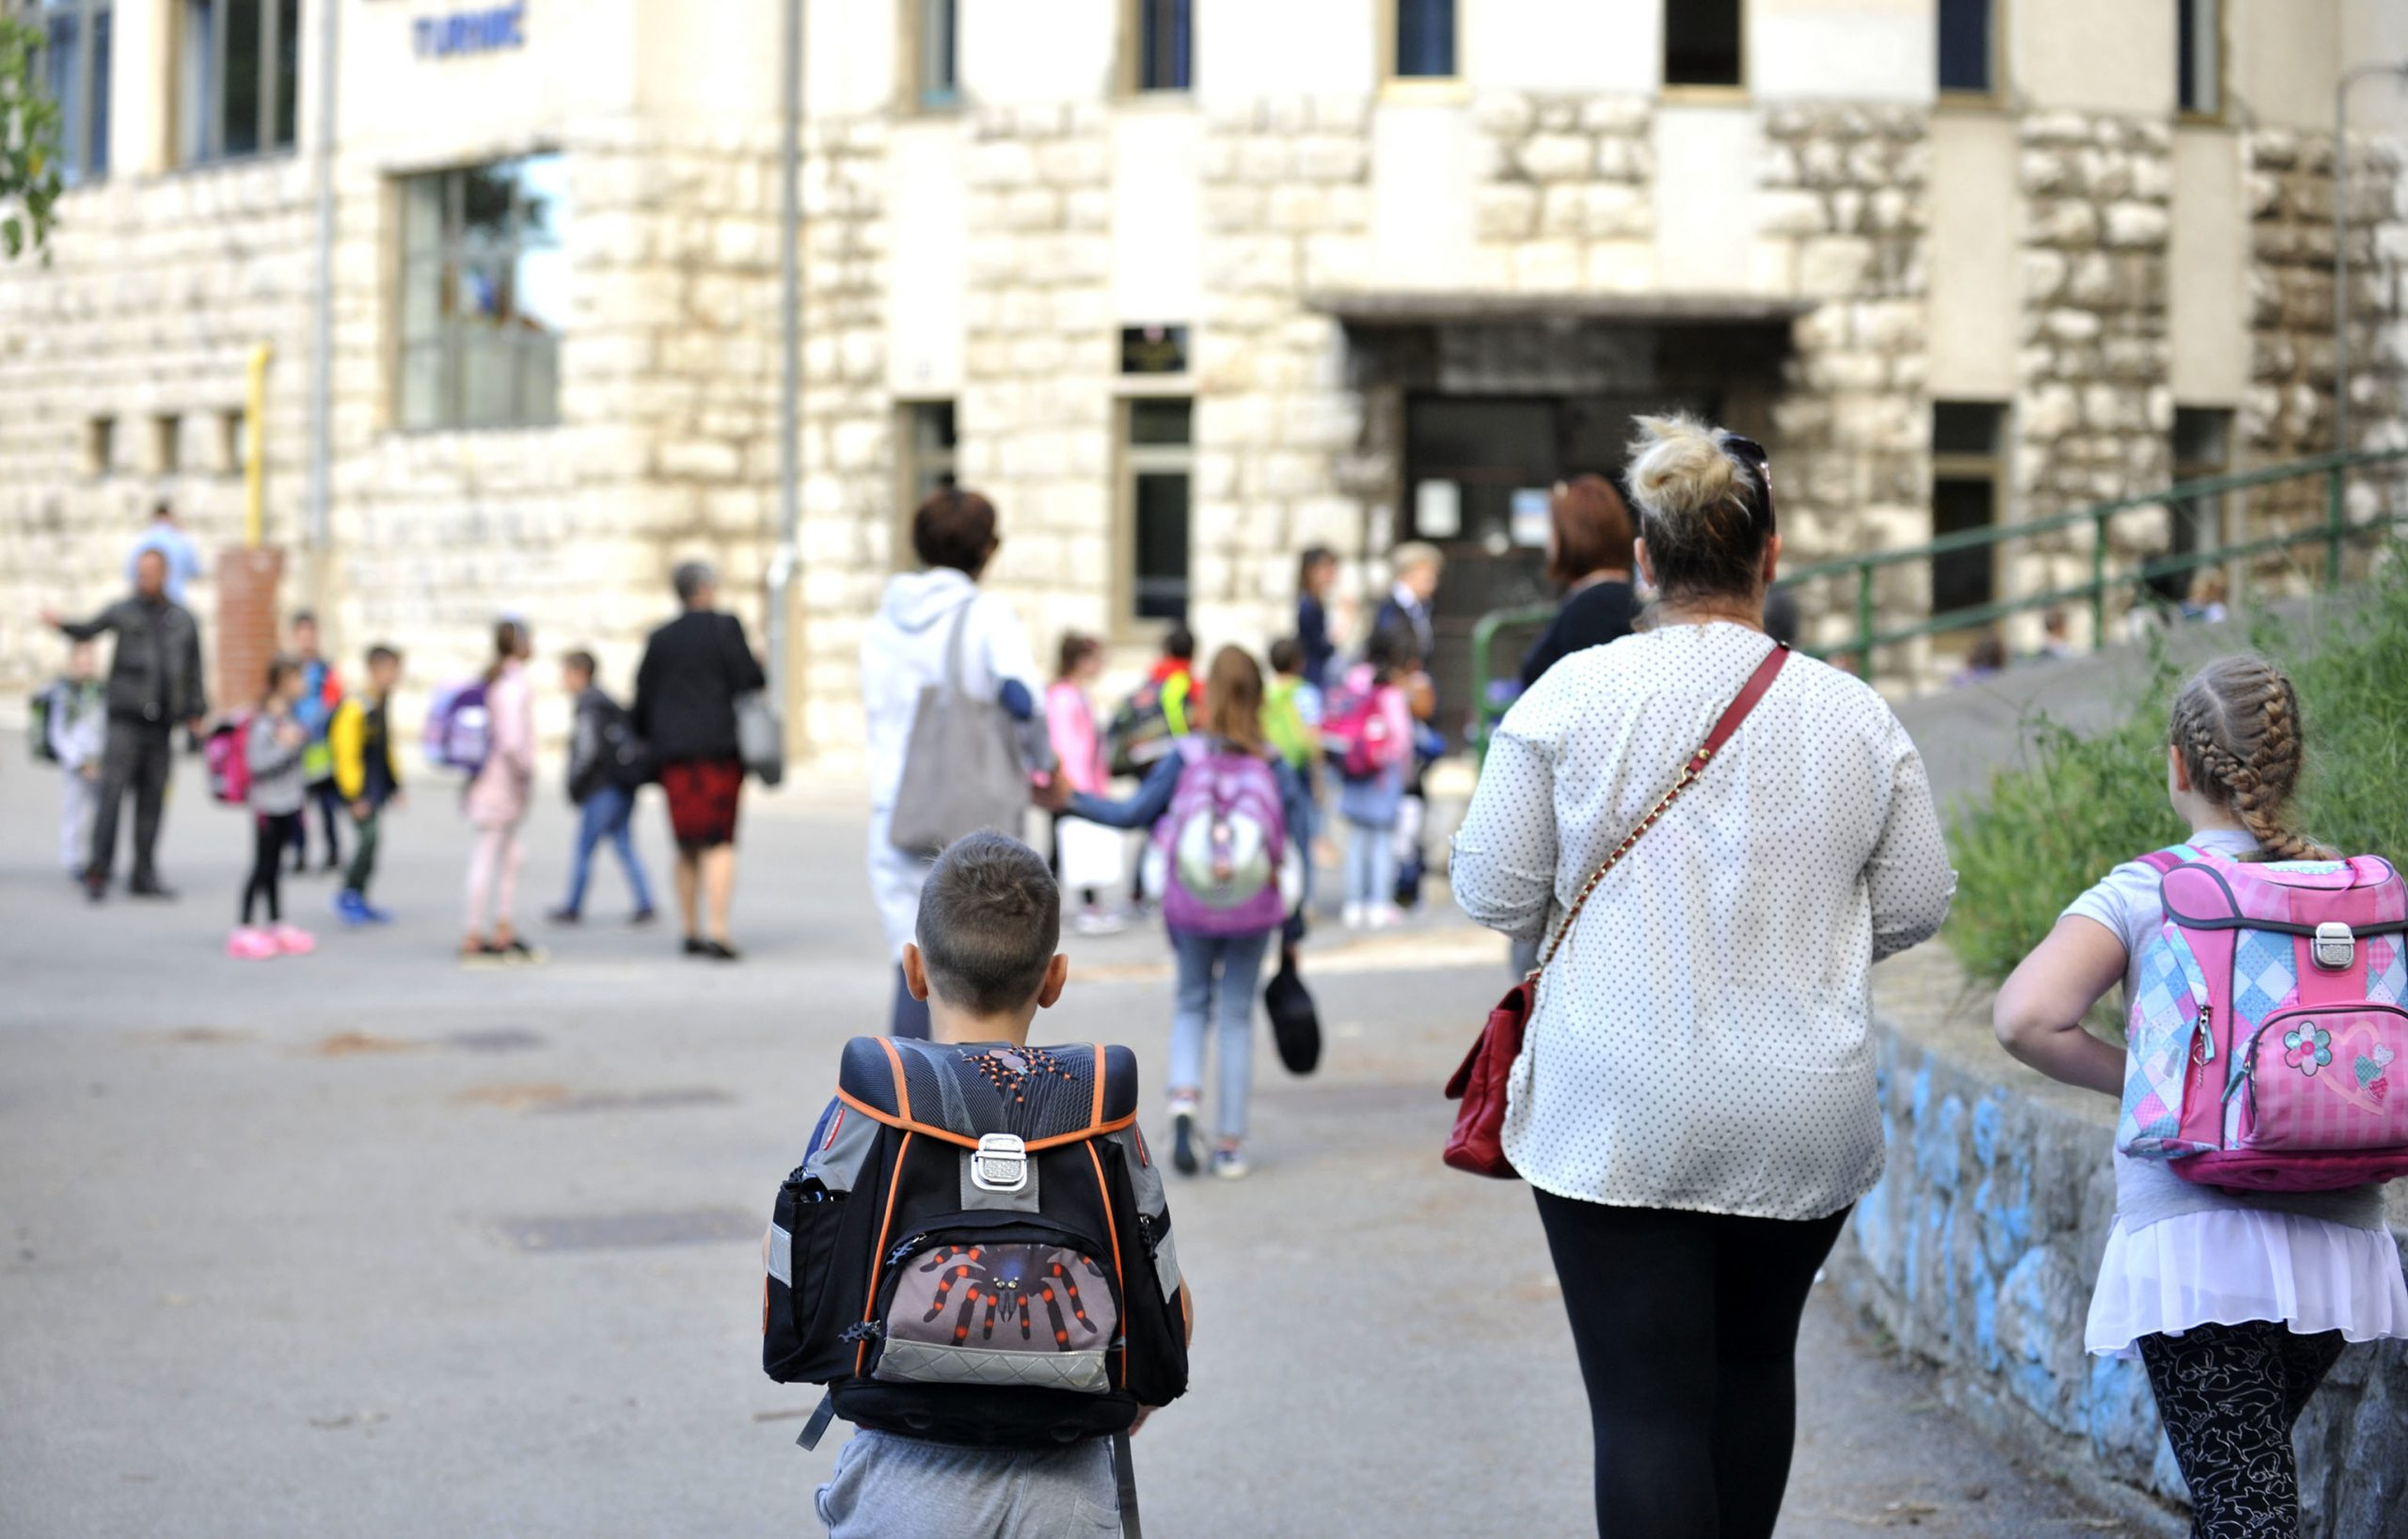 Pred školama zahtjevan posao organizacije nastave - OŠ Turnić / Snimio V. KARUZA